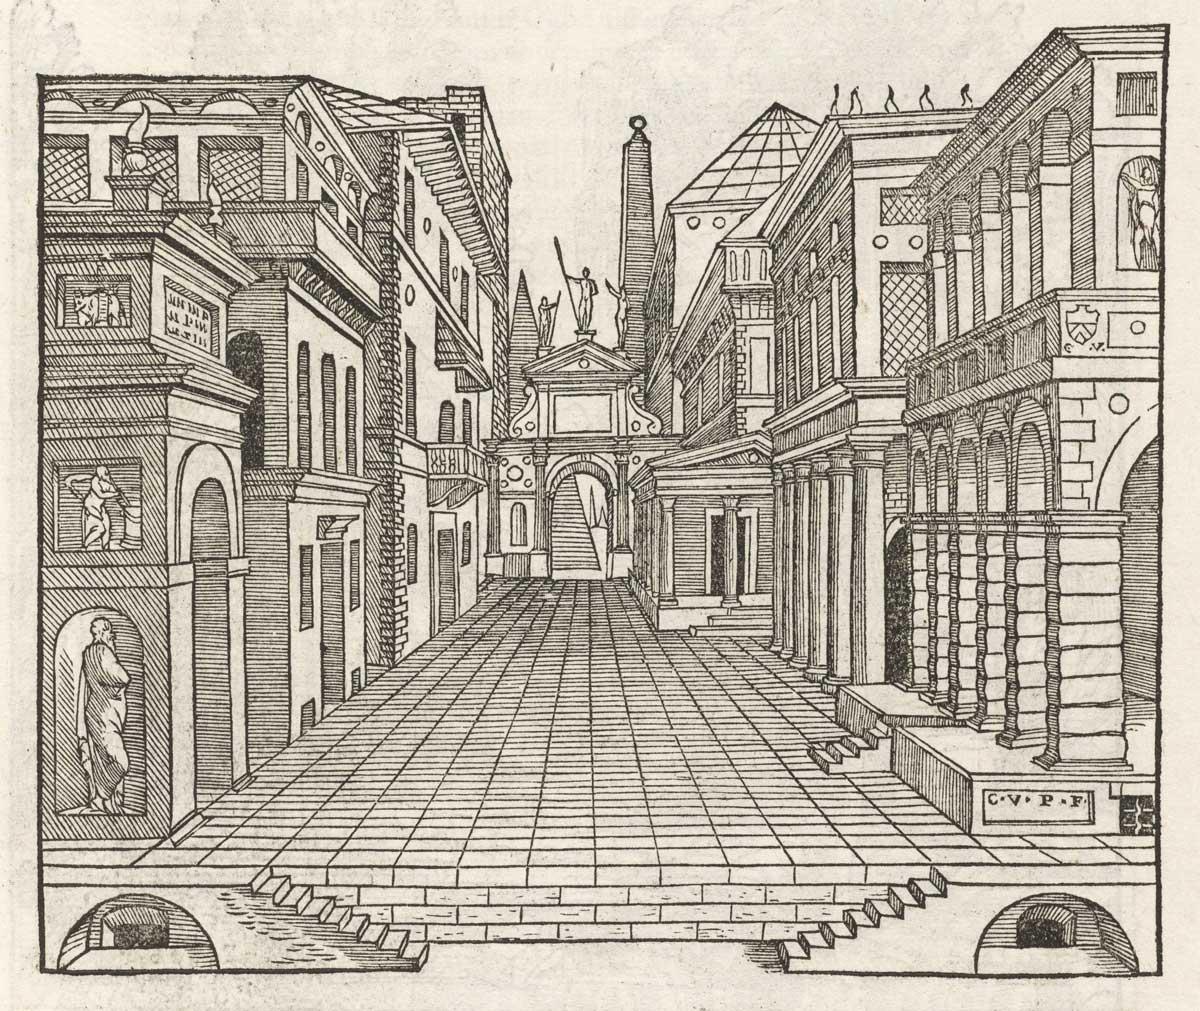 sebastiano serlio stage design